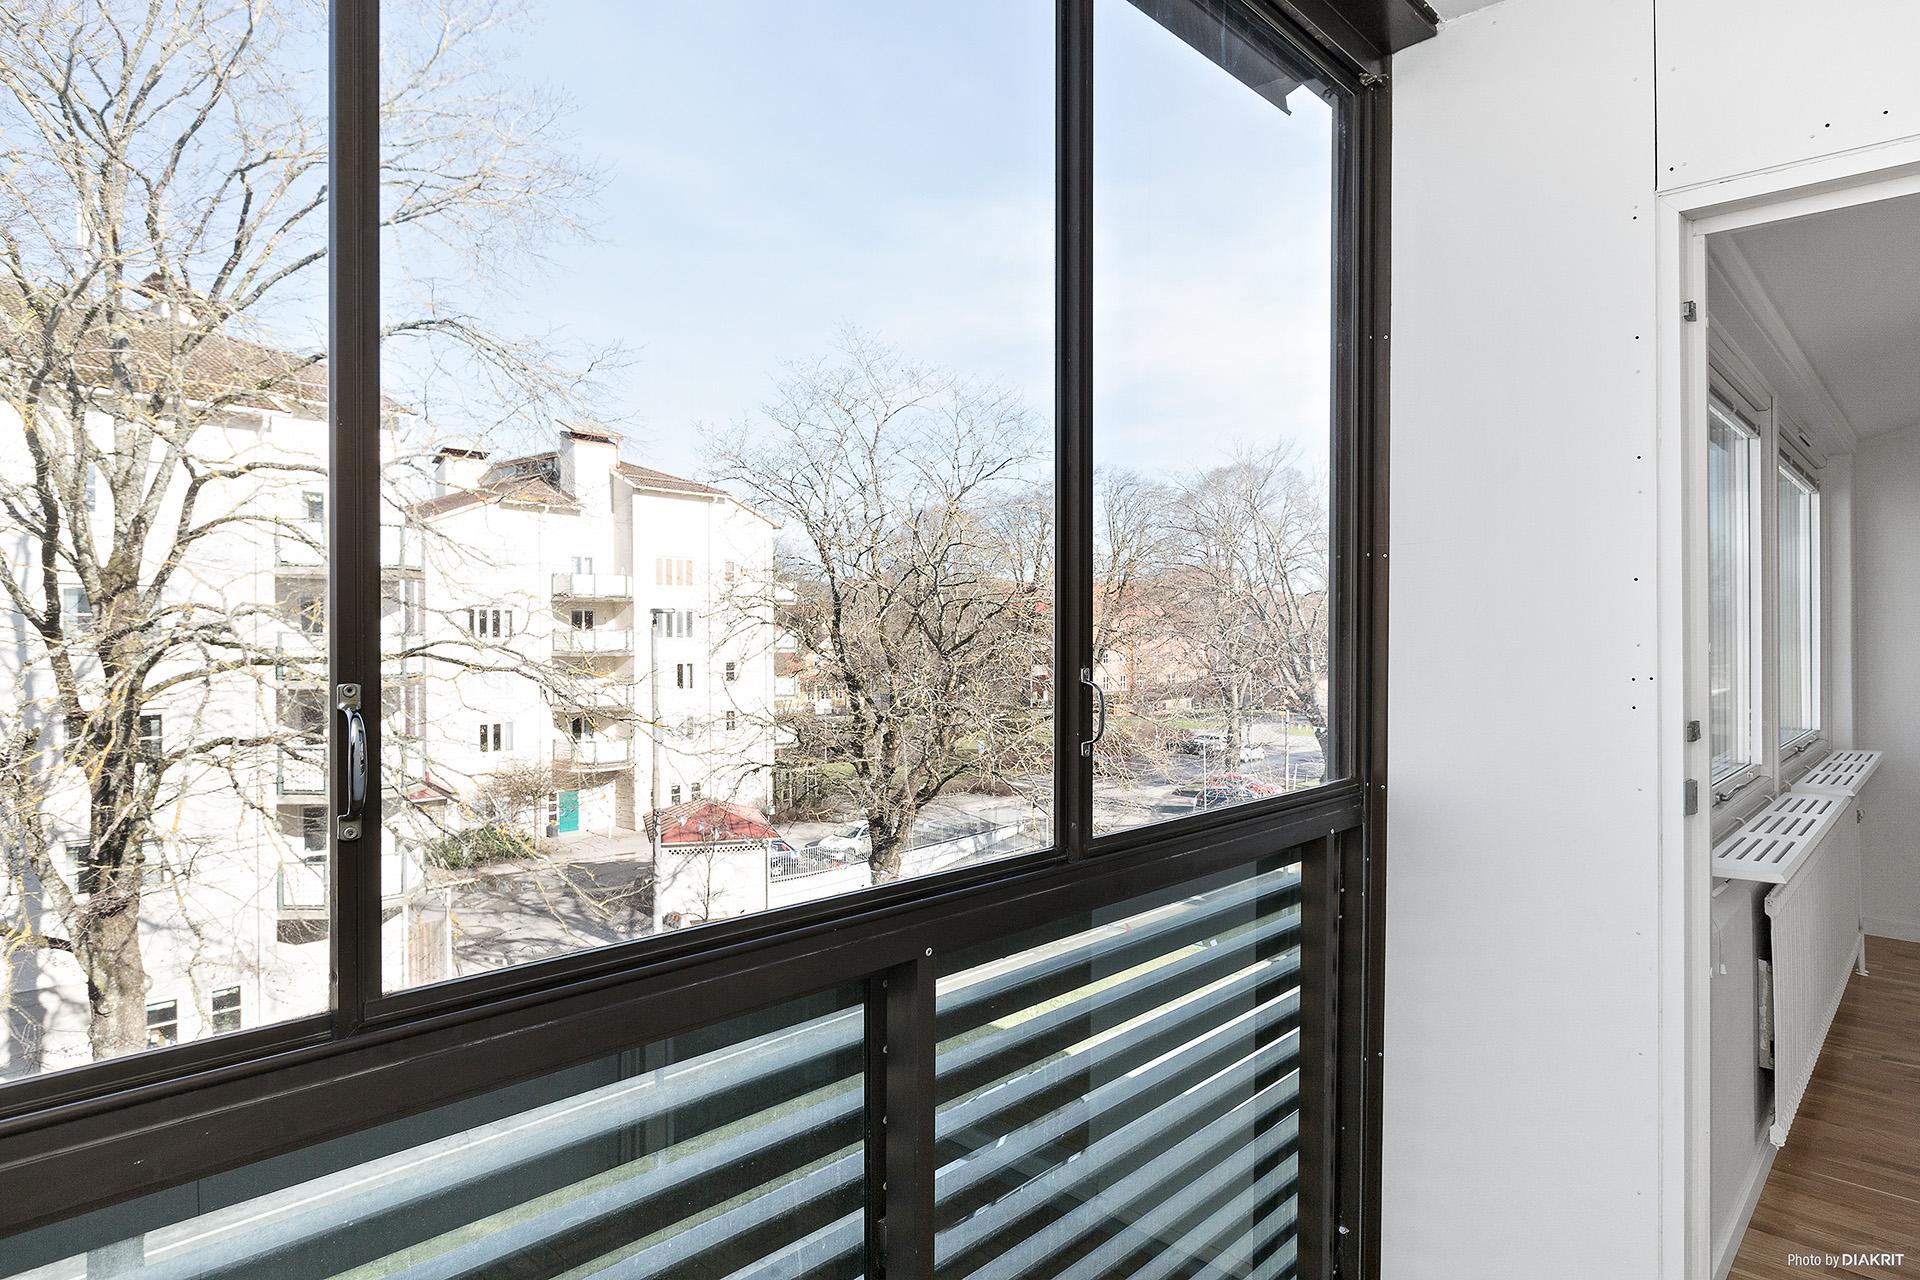 Inglasad balkong med skjutpartier